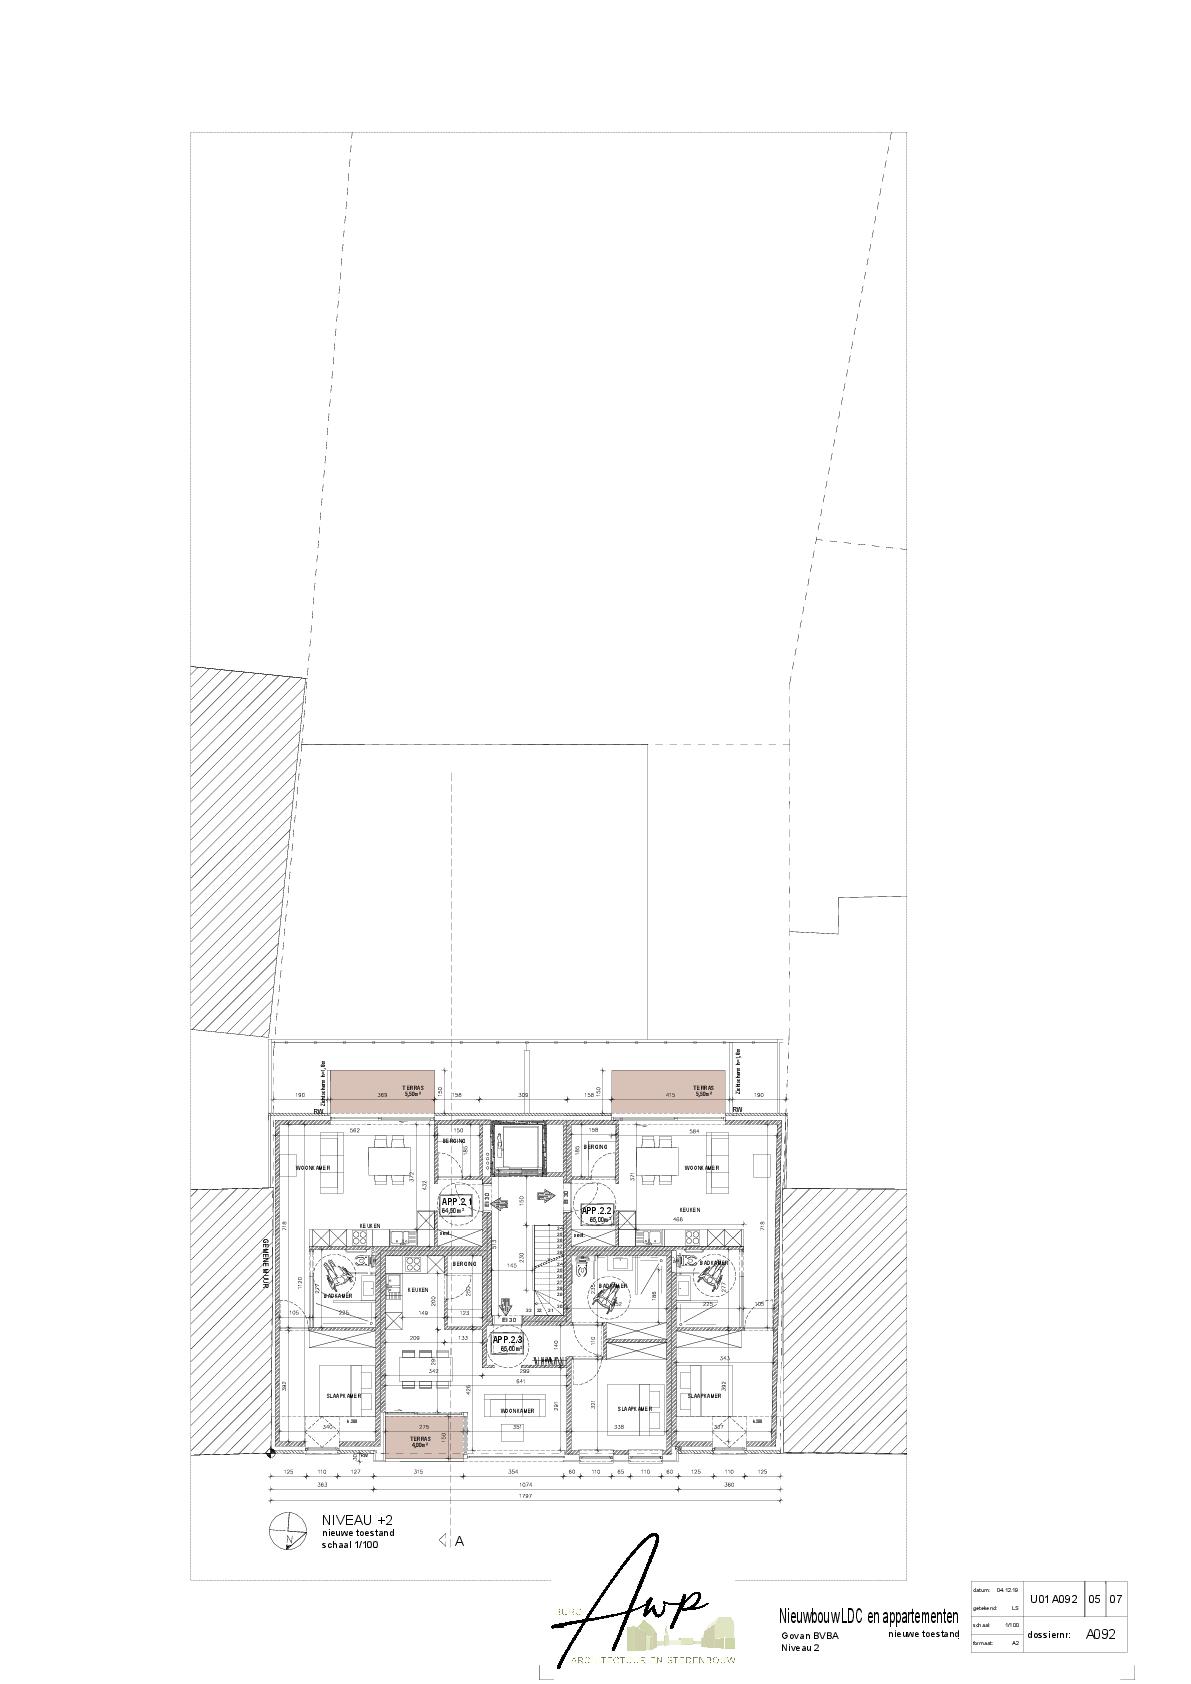 grondplan2.pdf